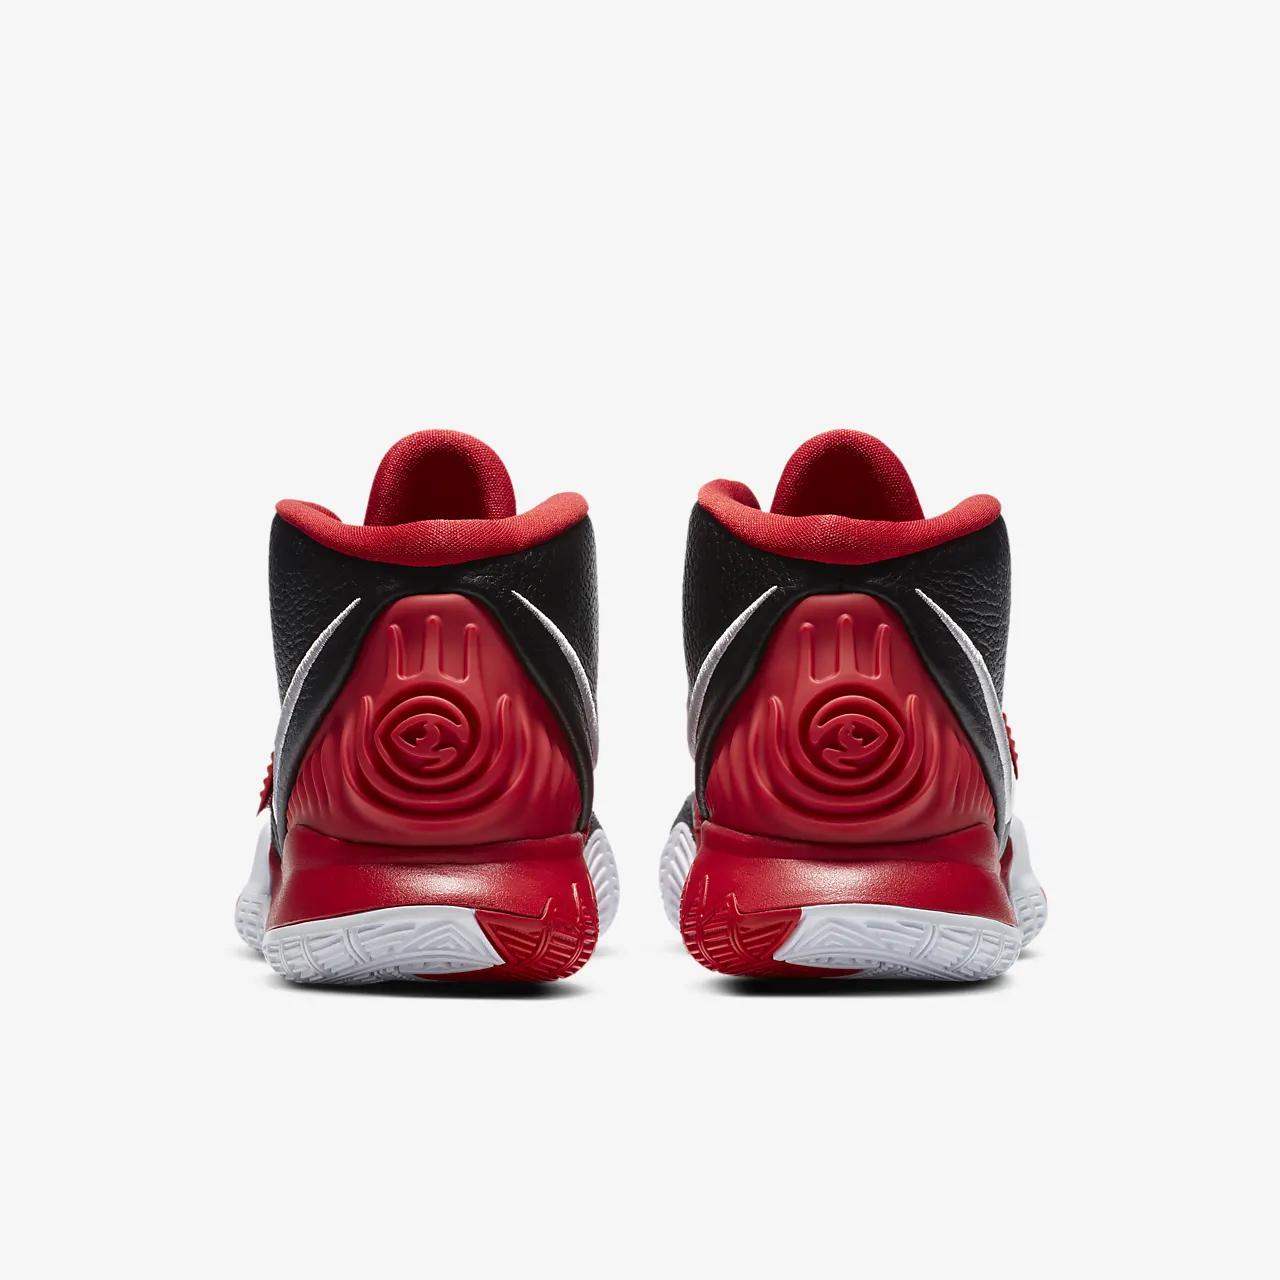 Kyrie 6 (Team) Basketball Shoe CK5869-004